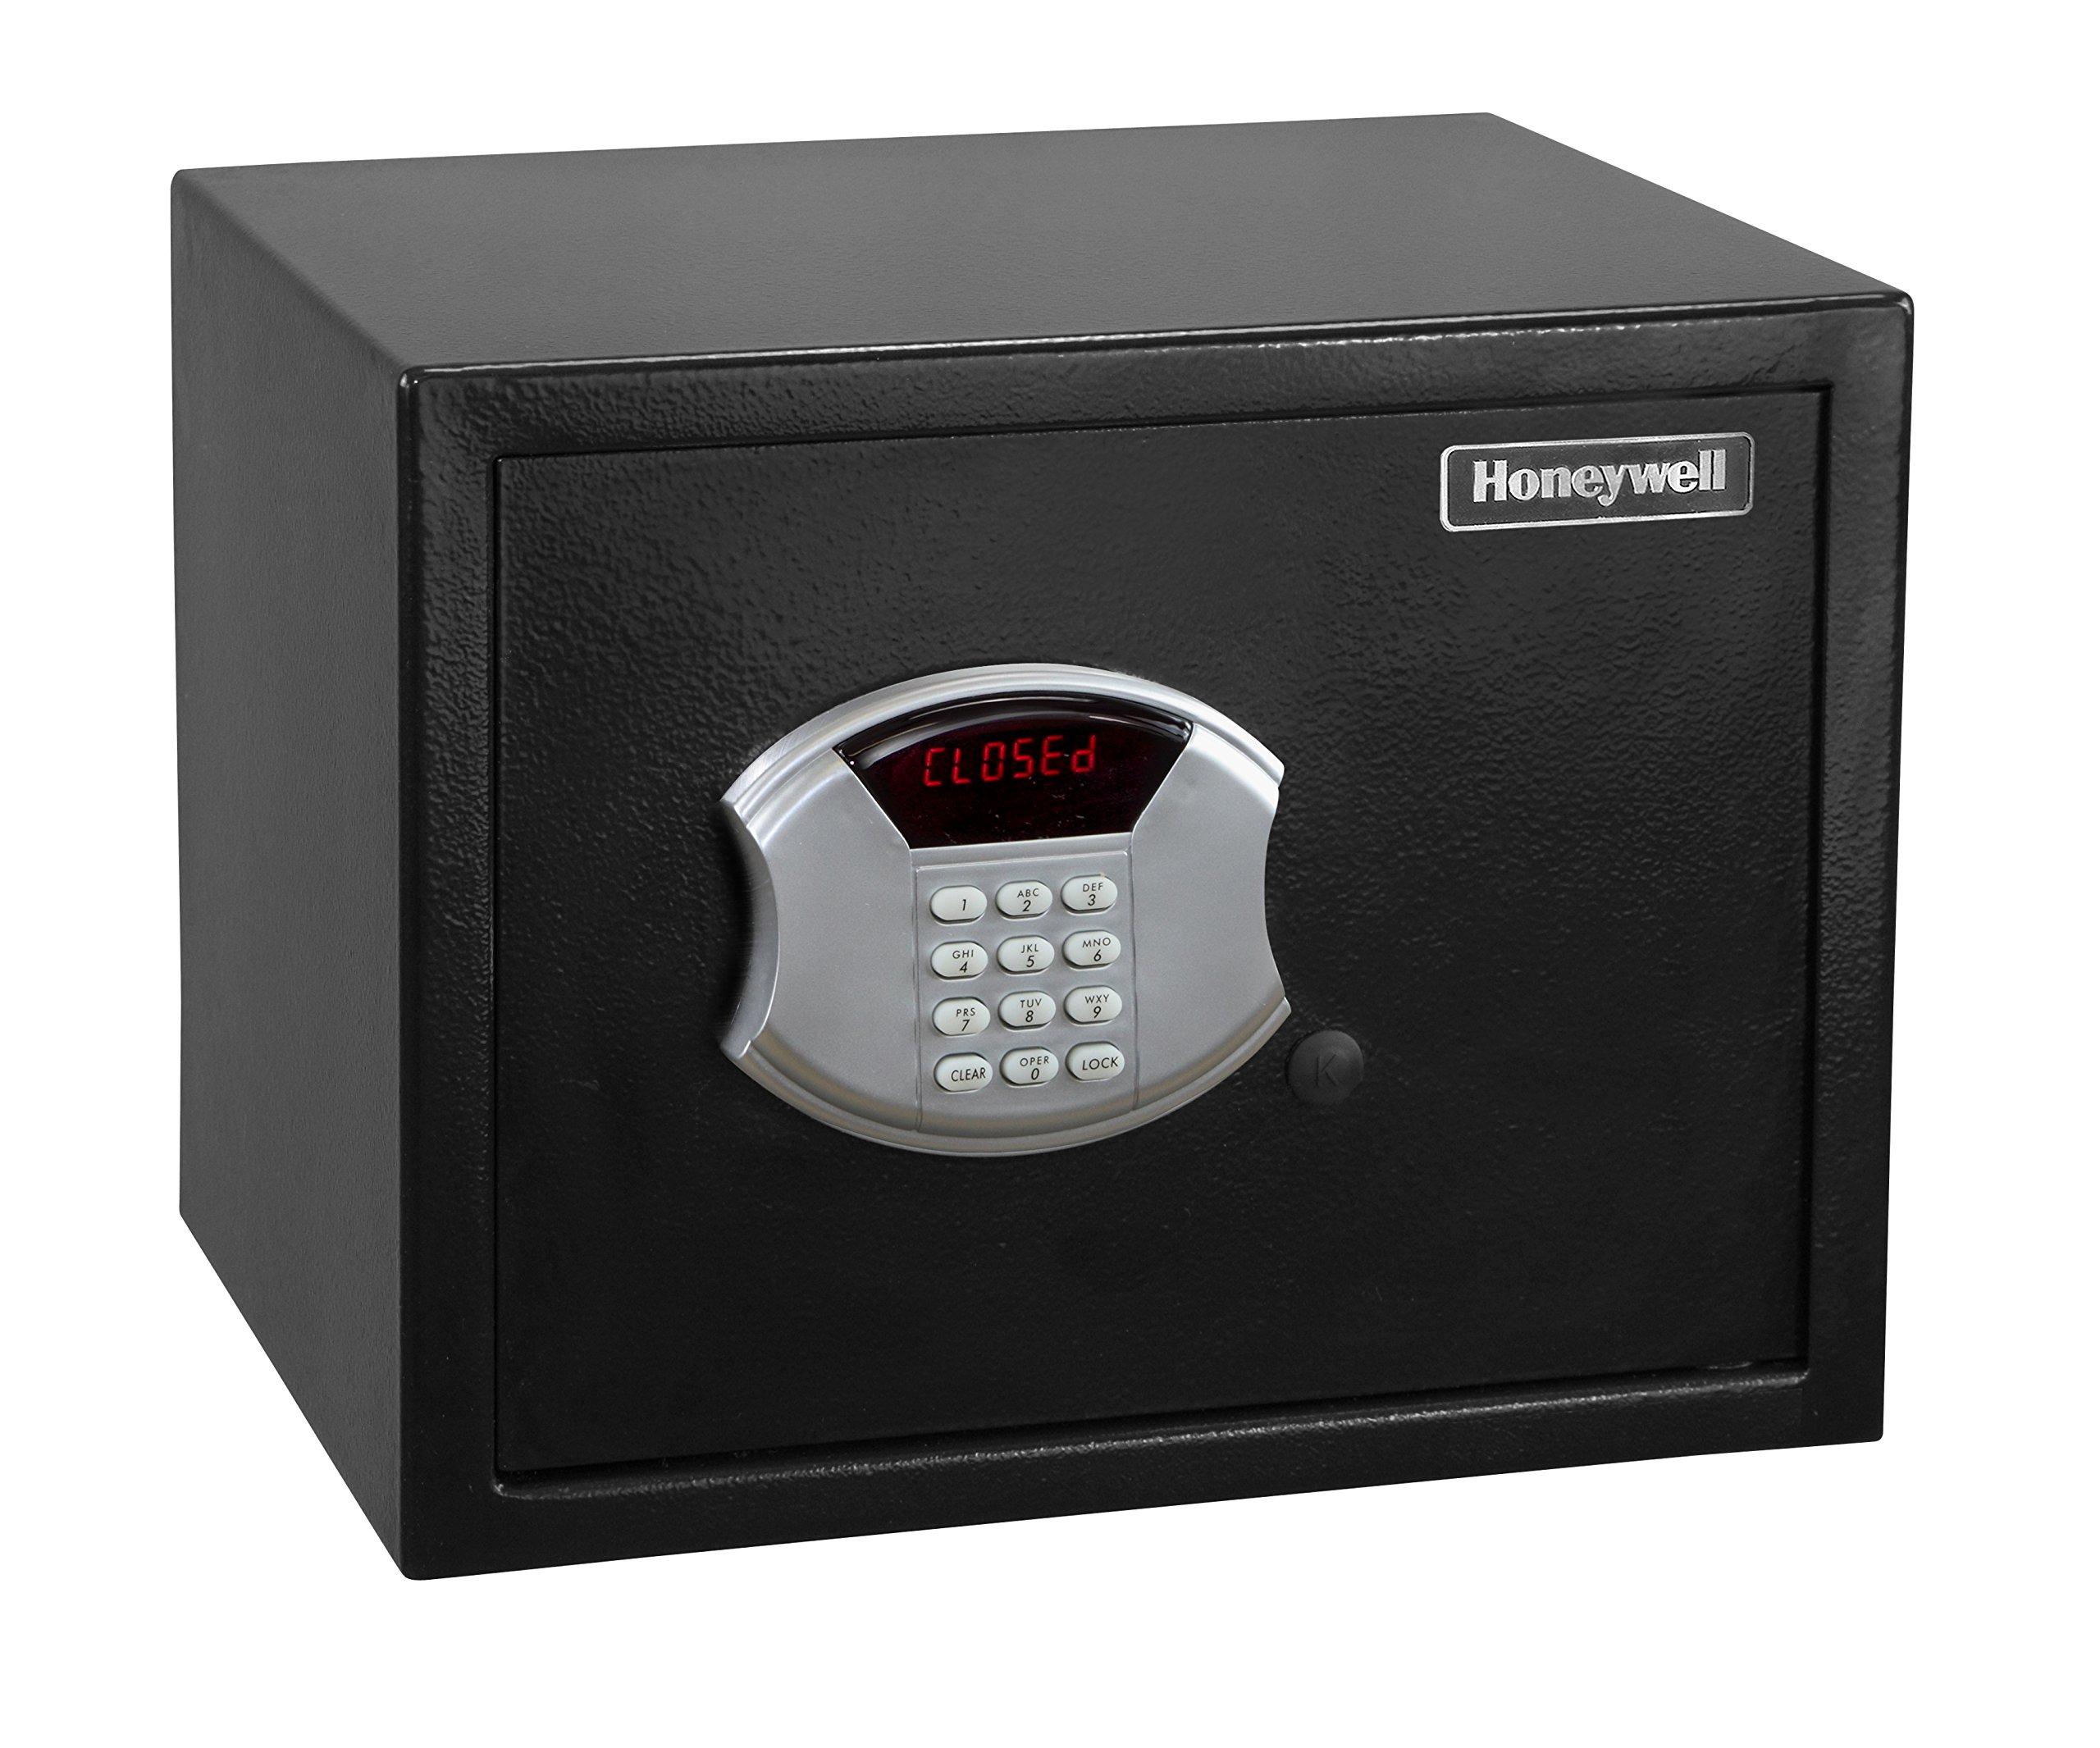 Honeywell Safes & Door Locks 5103 Medium Steel Security Safe with Hotel-Style Digital Lock HONEYWELL-5103 Medium 0.83-Cubic Feet, Medium, Black by Honeywell Safes & Door Locks